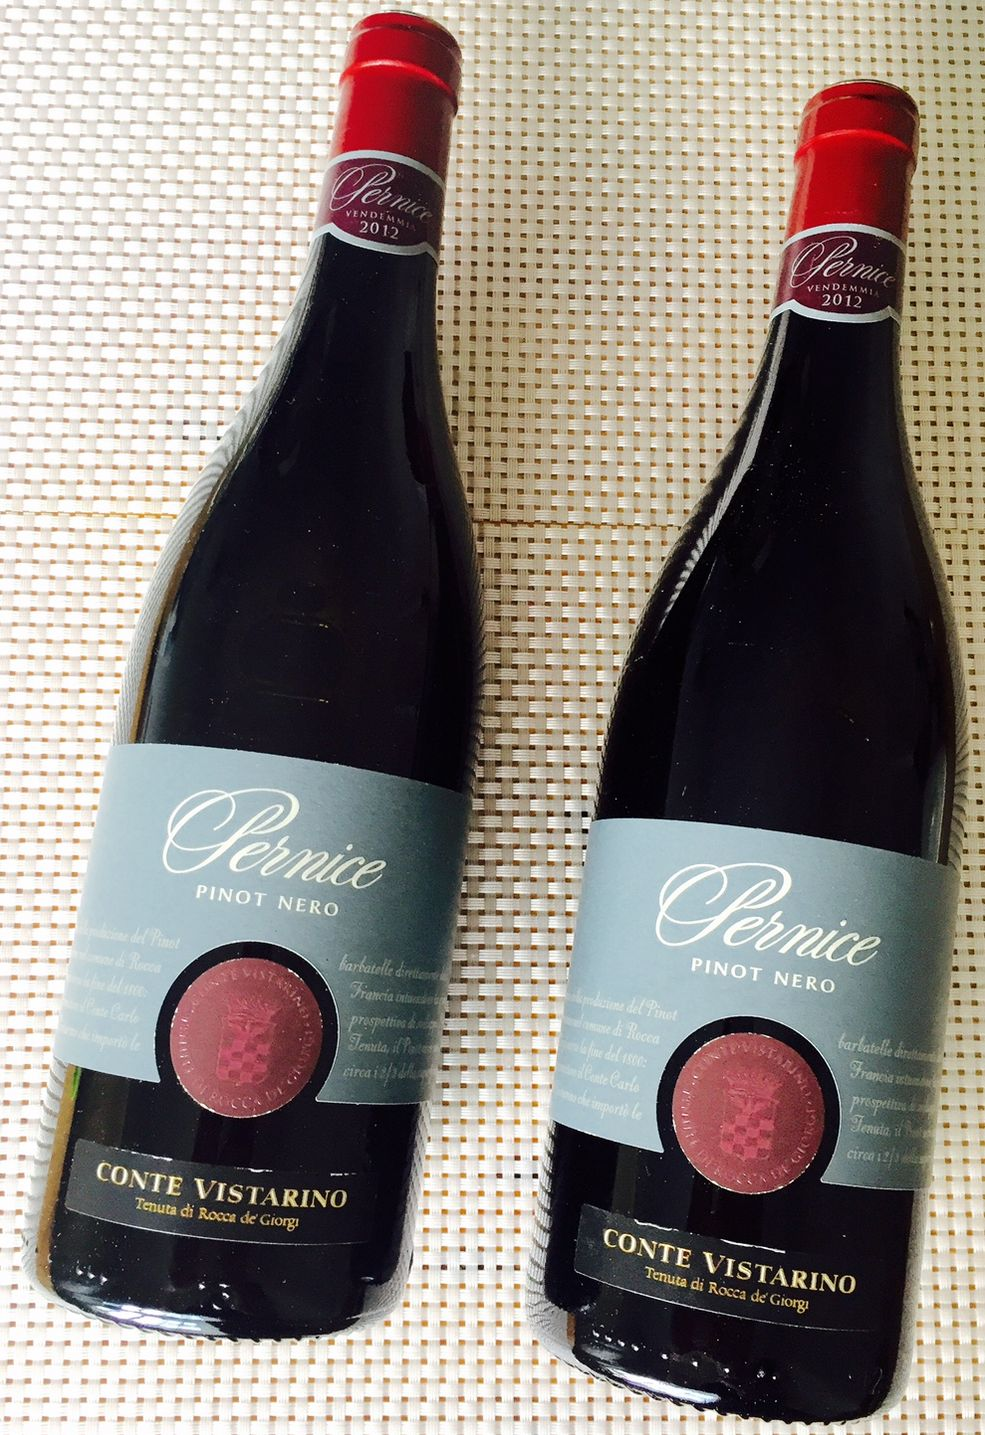 Pernice, Conte Vistarino, Pinot Nero, 2012